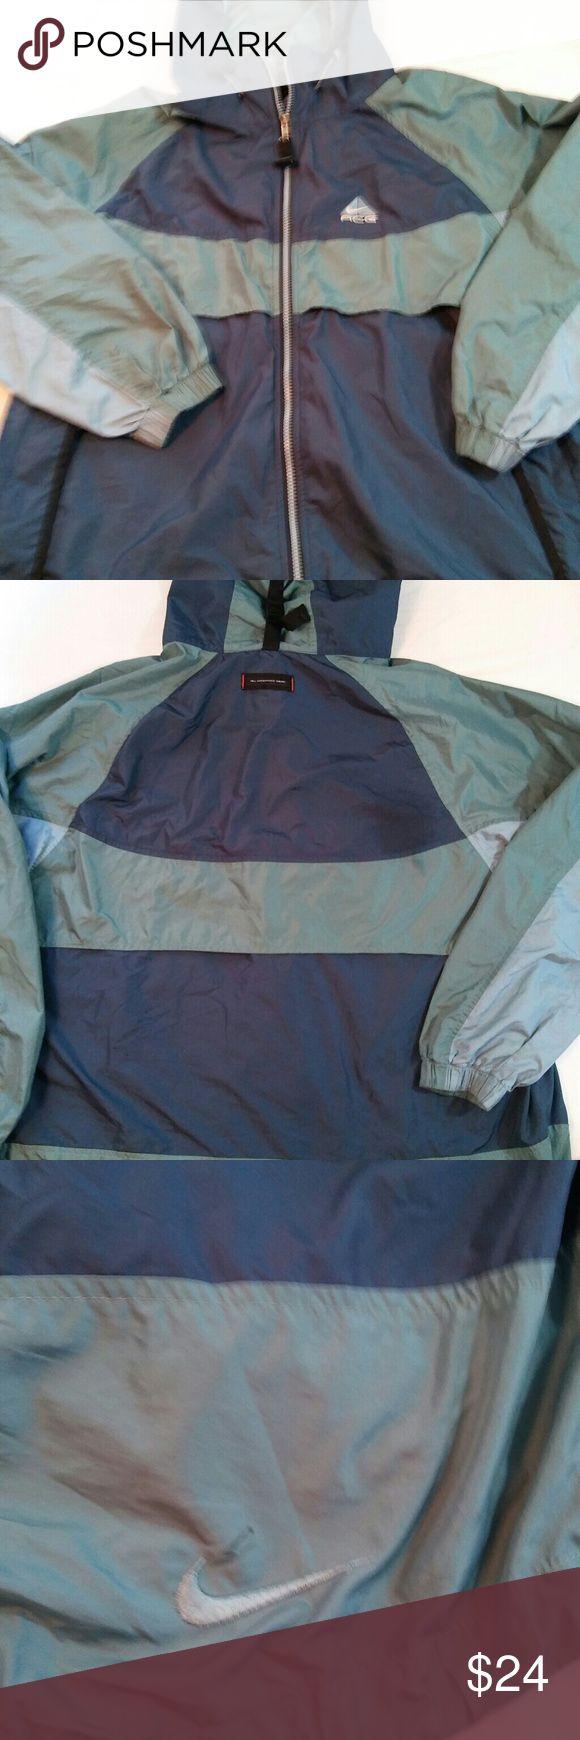 Nike ACG jacket, XL Nike jacket, with hood, full zipper, all conditions gear Nike ACG Jackets & Coats Lightweight & Shirt Jackets